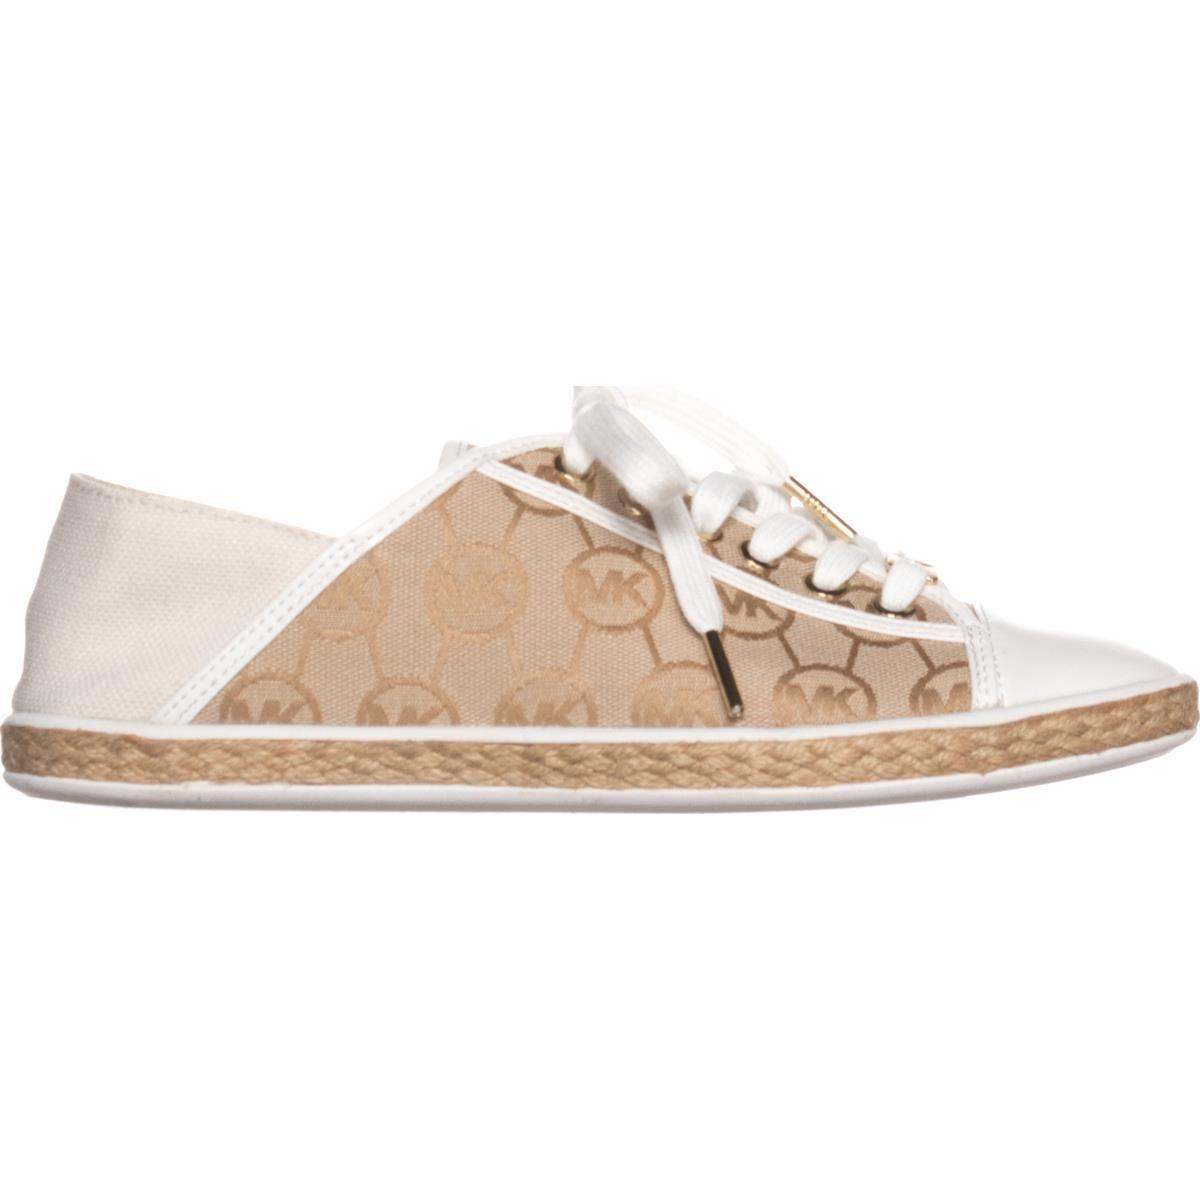 633b6fd1520 MICHAEL Michael Kors Kristy Slide Heel Cap Espadrille Sneakers 393 ...